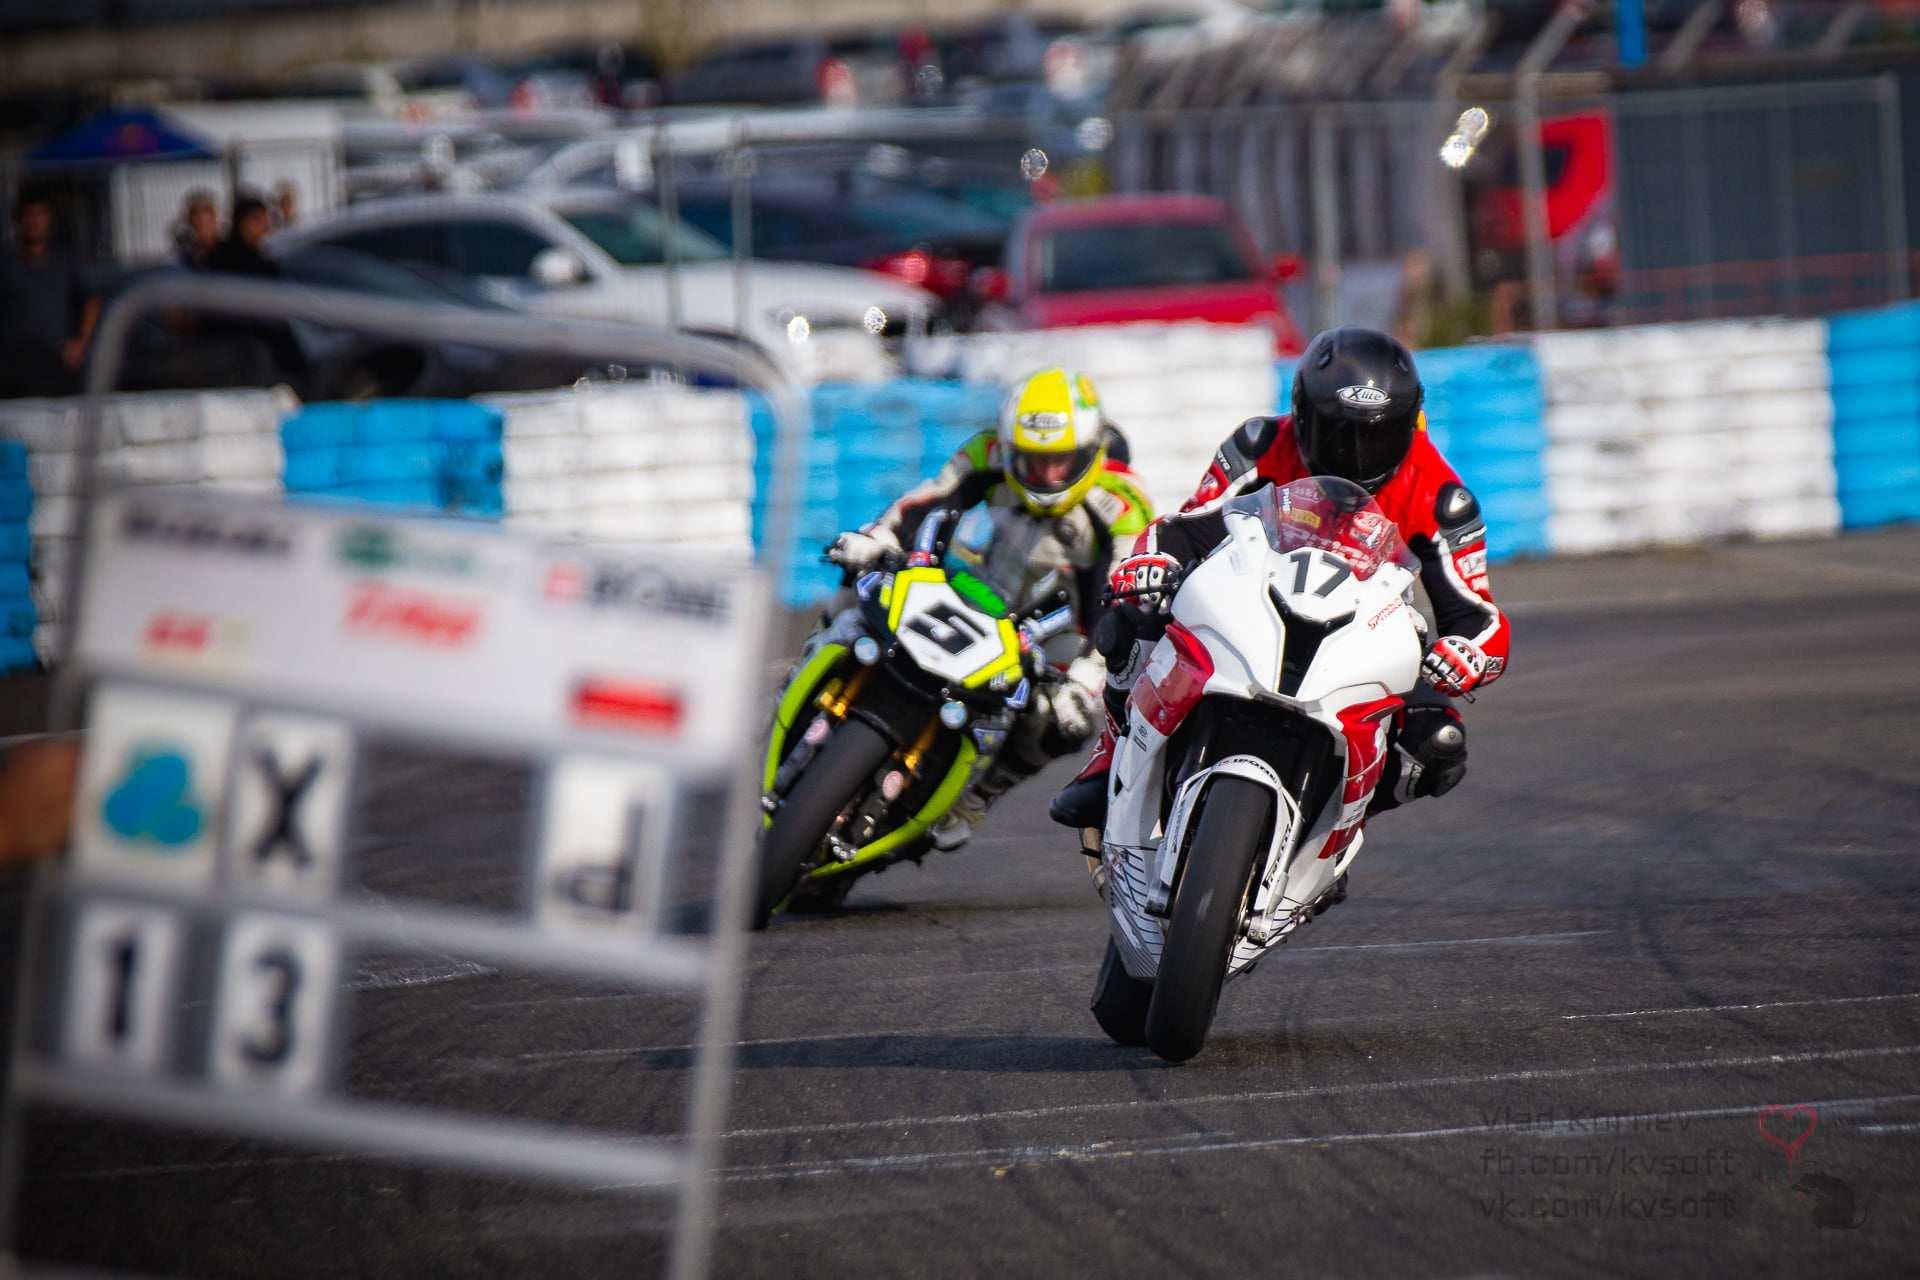 5-6_etap_MotoGPUkraine_162